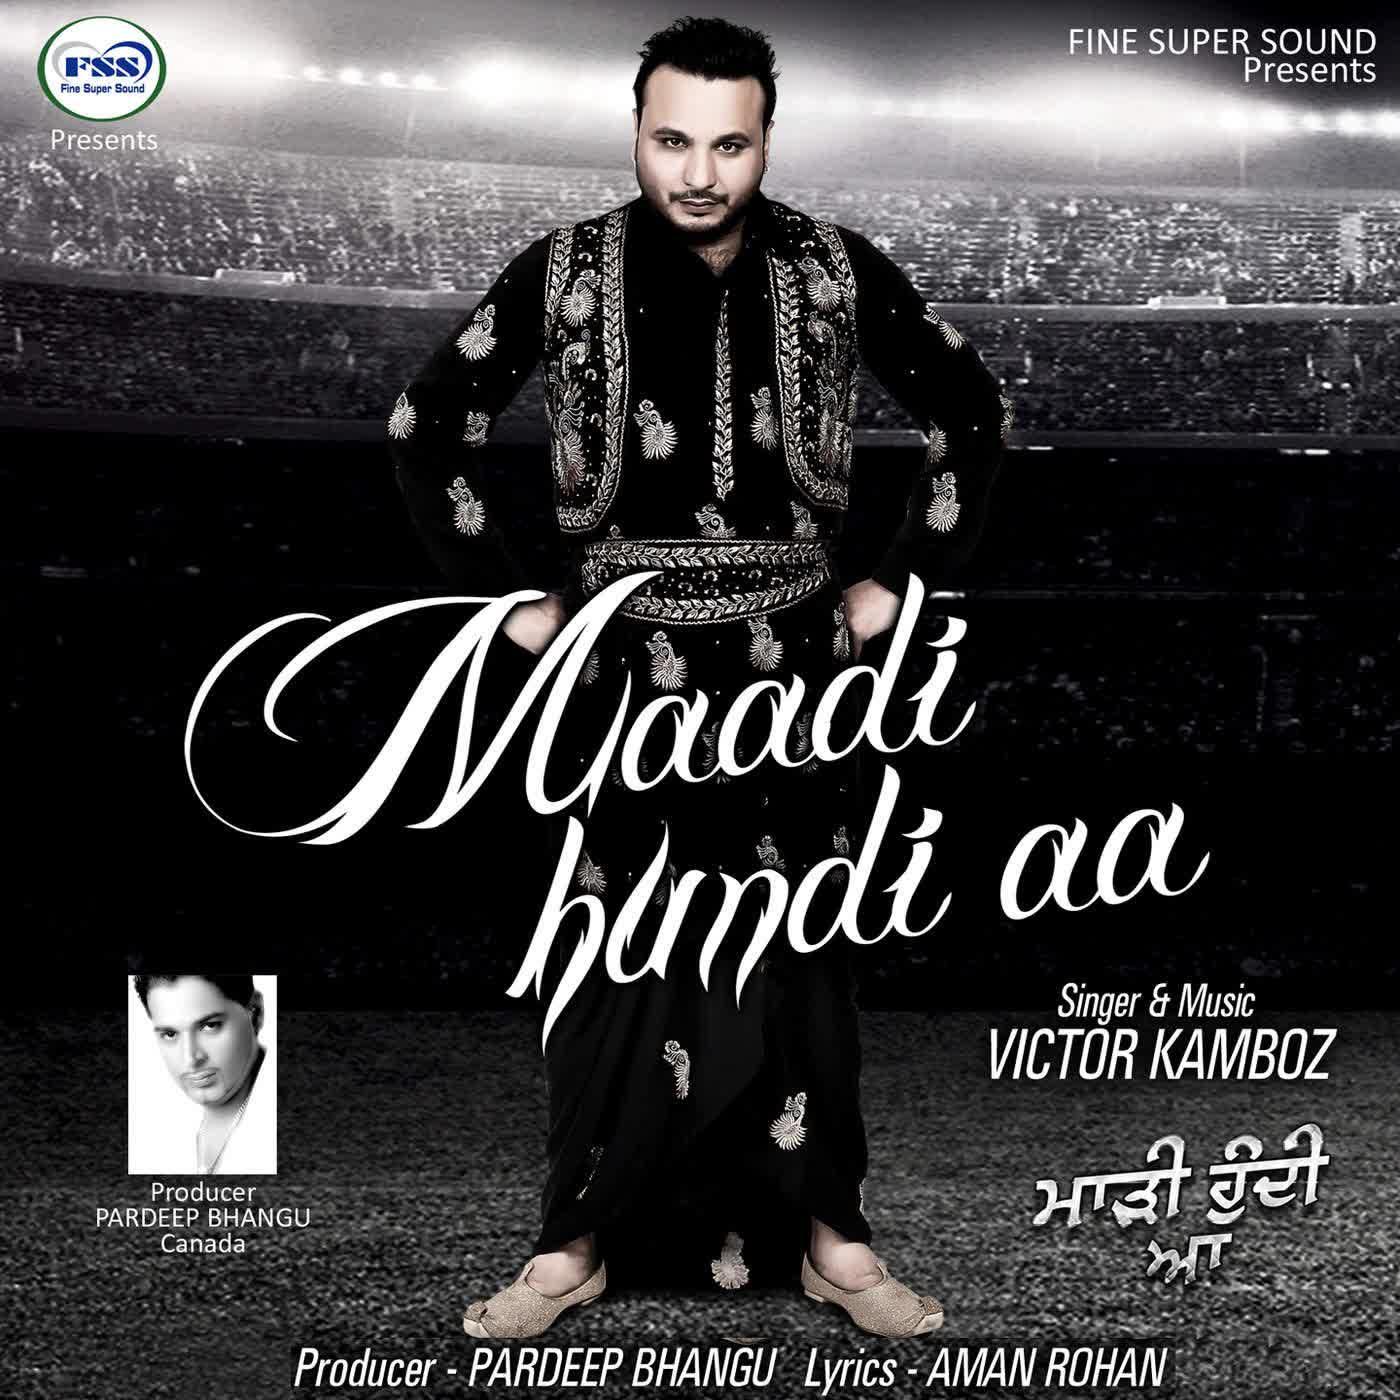 https://cover.djpunjab.org/37555/300x250/Maadi_Hundi_Aa_Victor_Kamboz.jpg